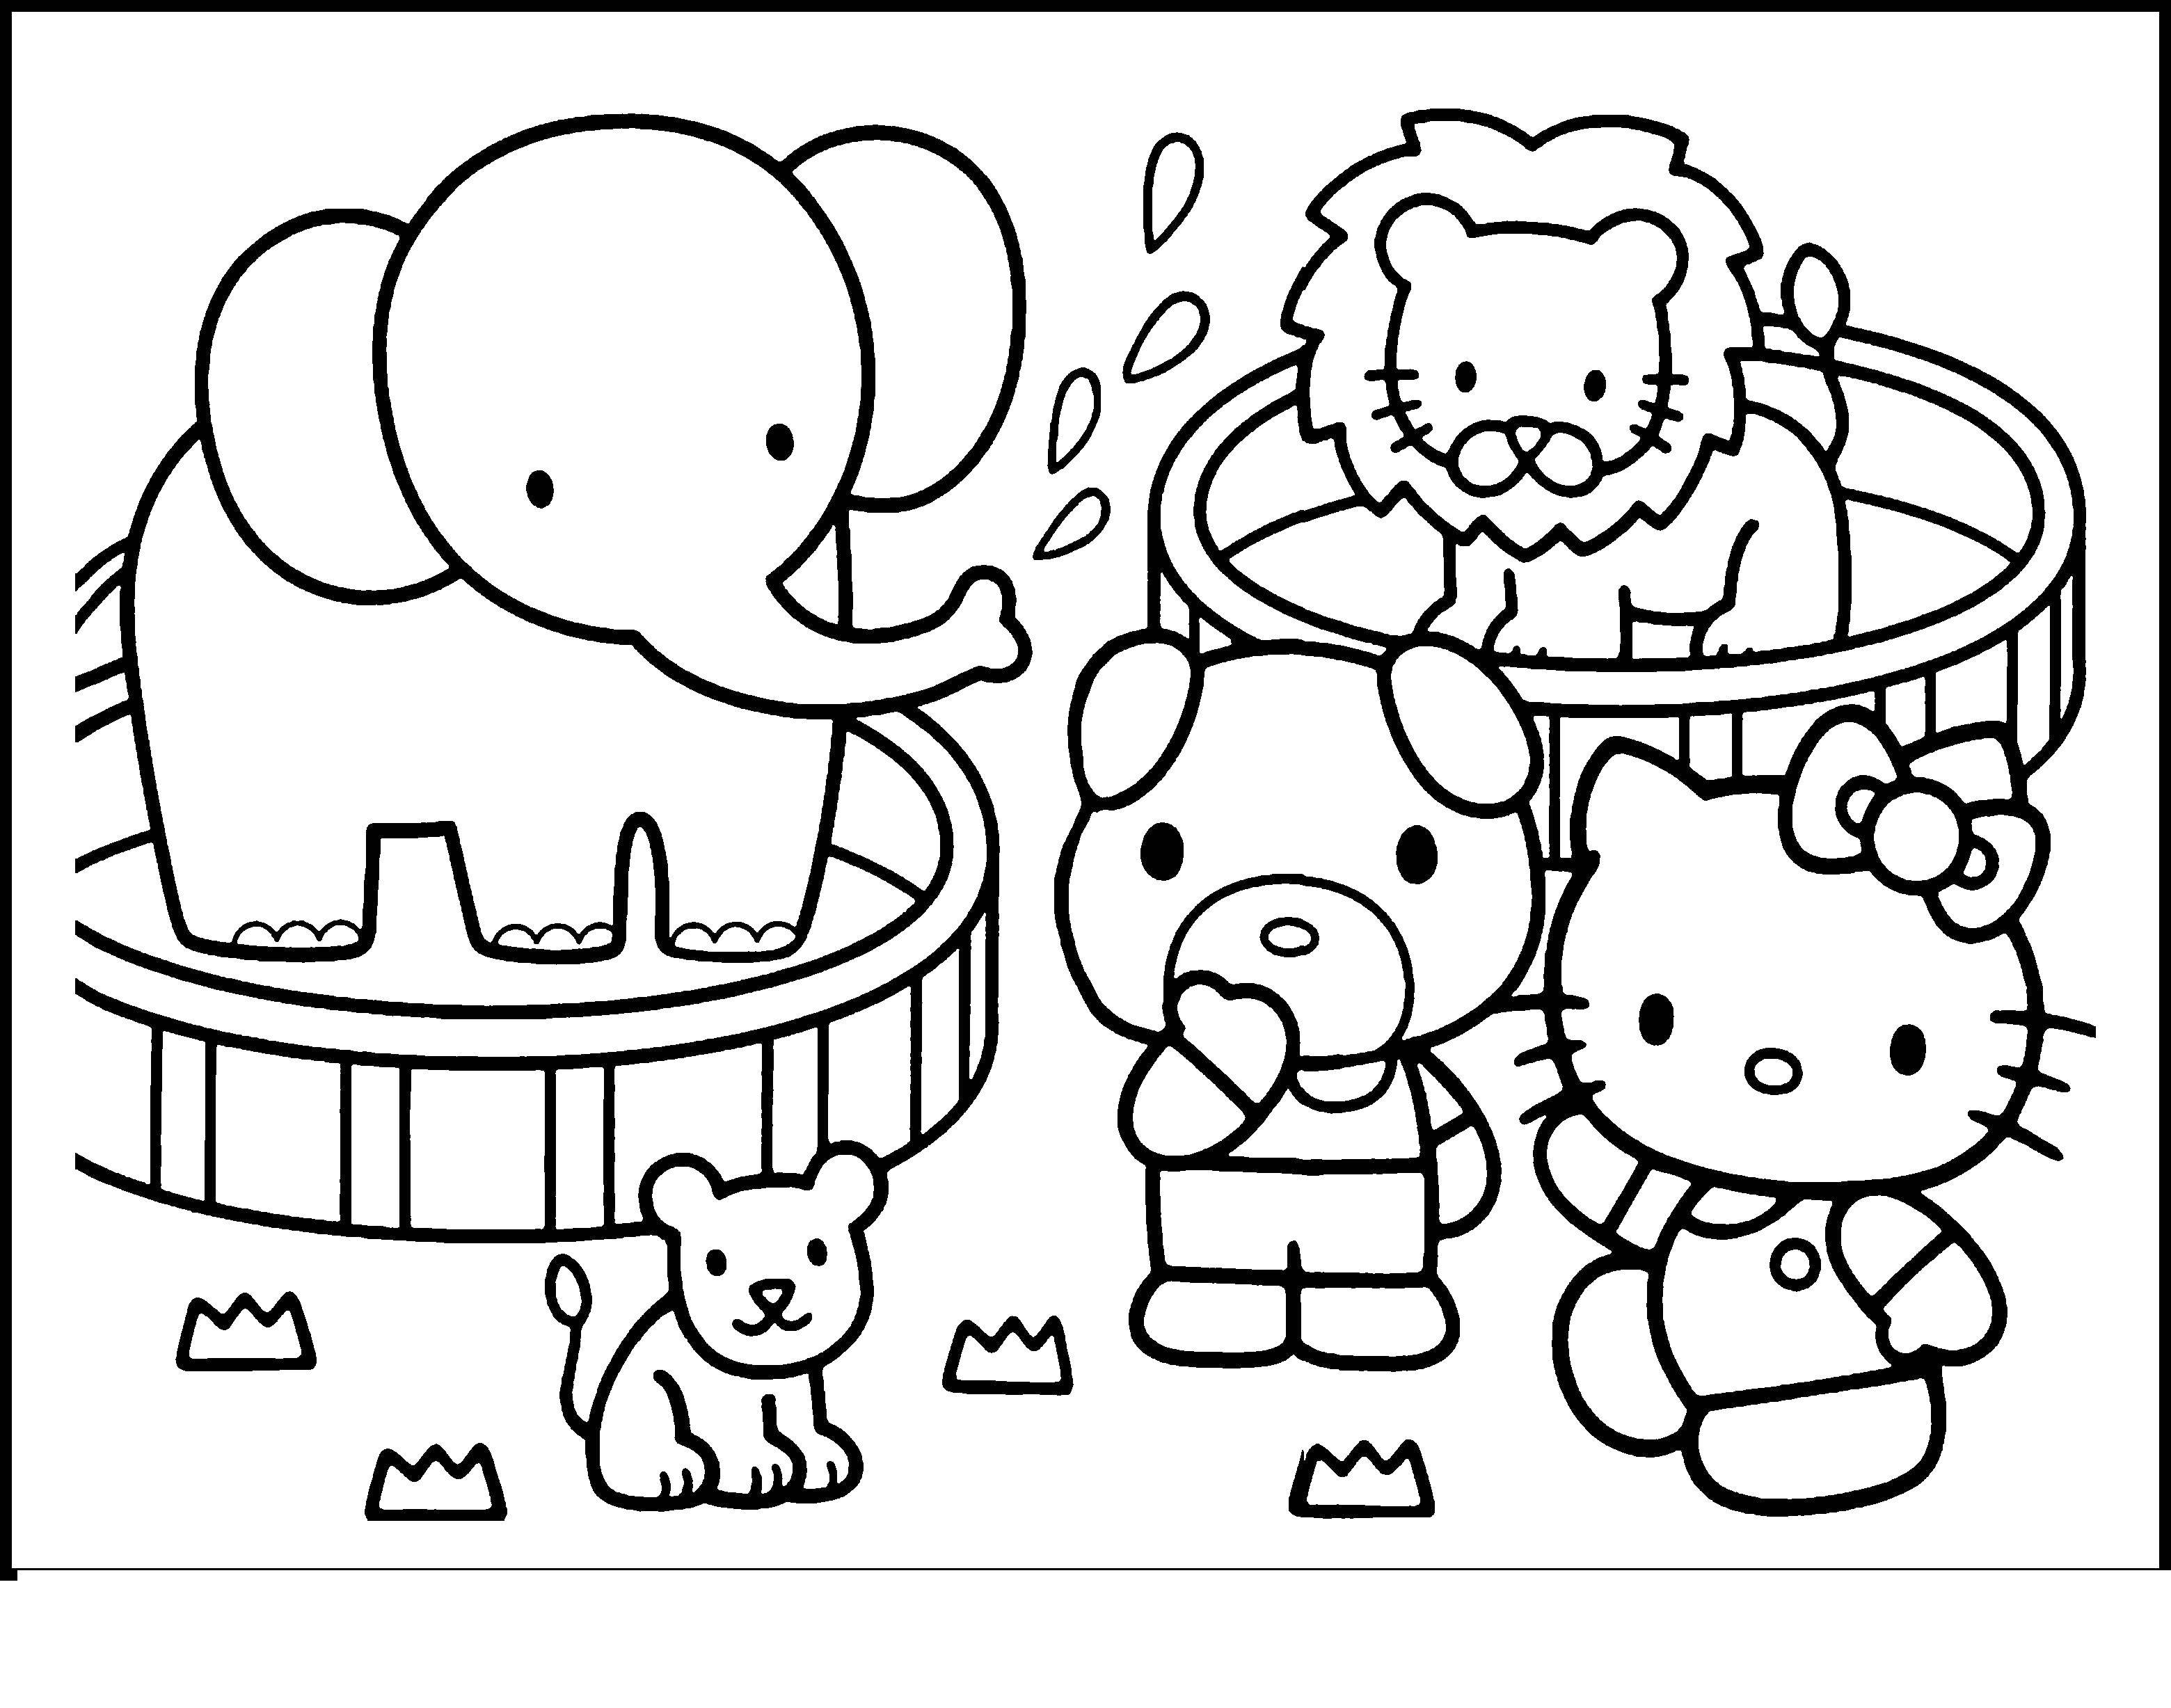 Раскраска Hello kitty в зоопарке Скачать ,Hello Kitty, слон, тигр,.  Распечатать